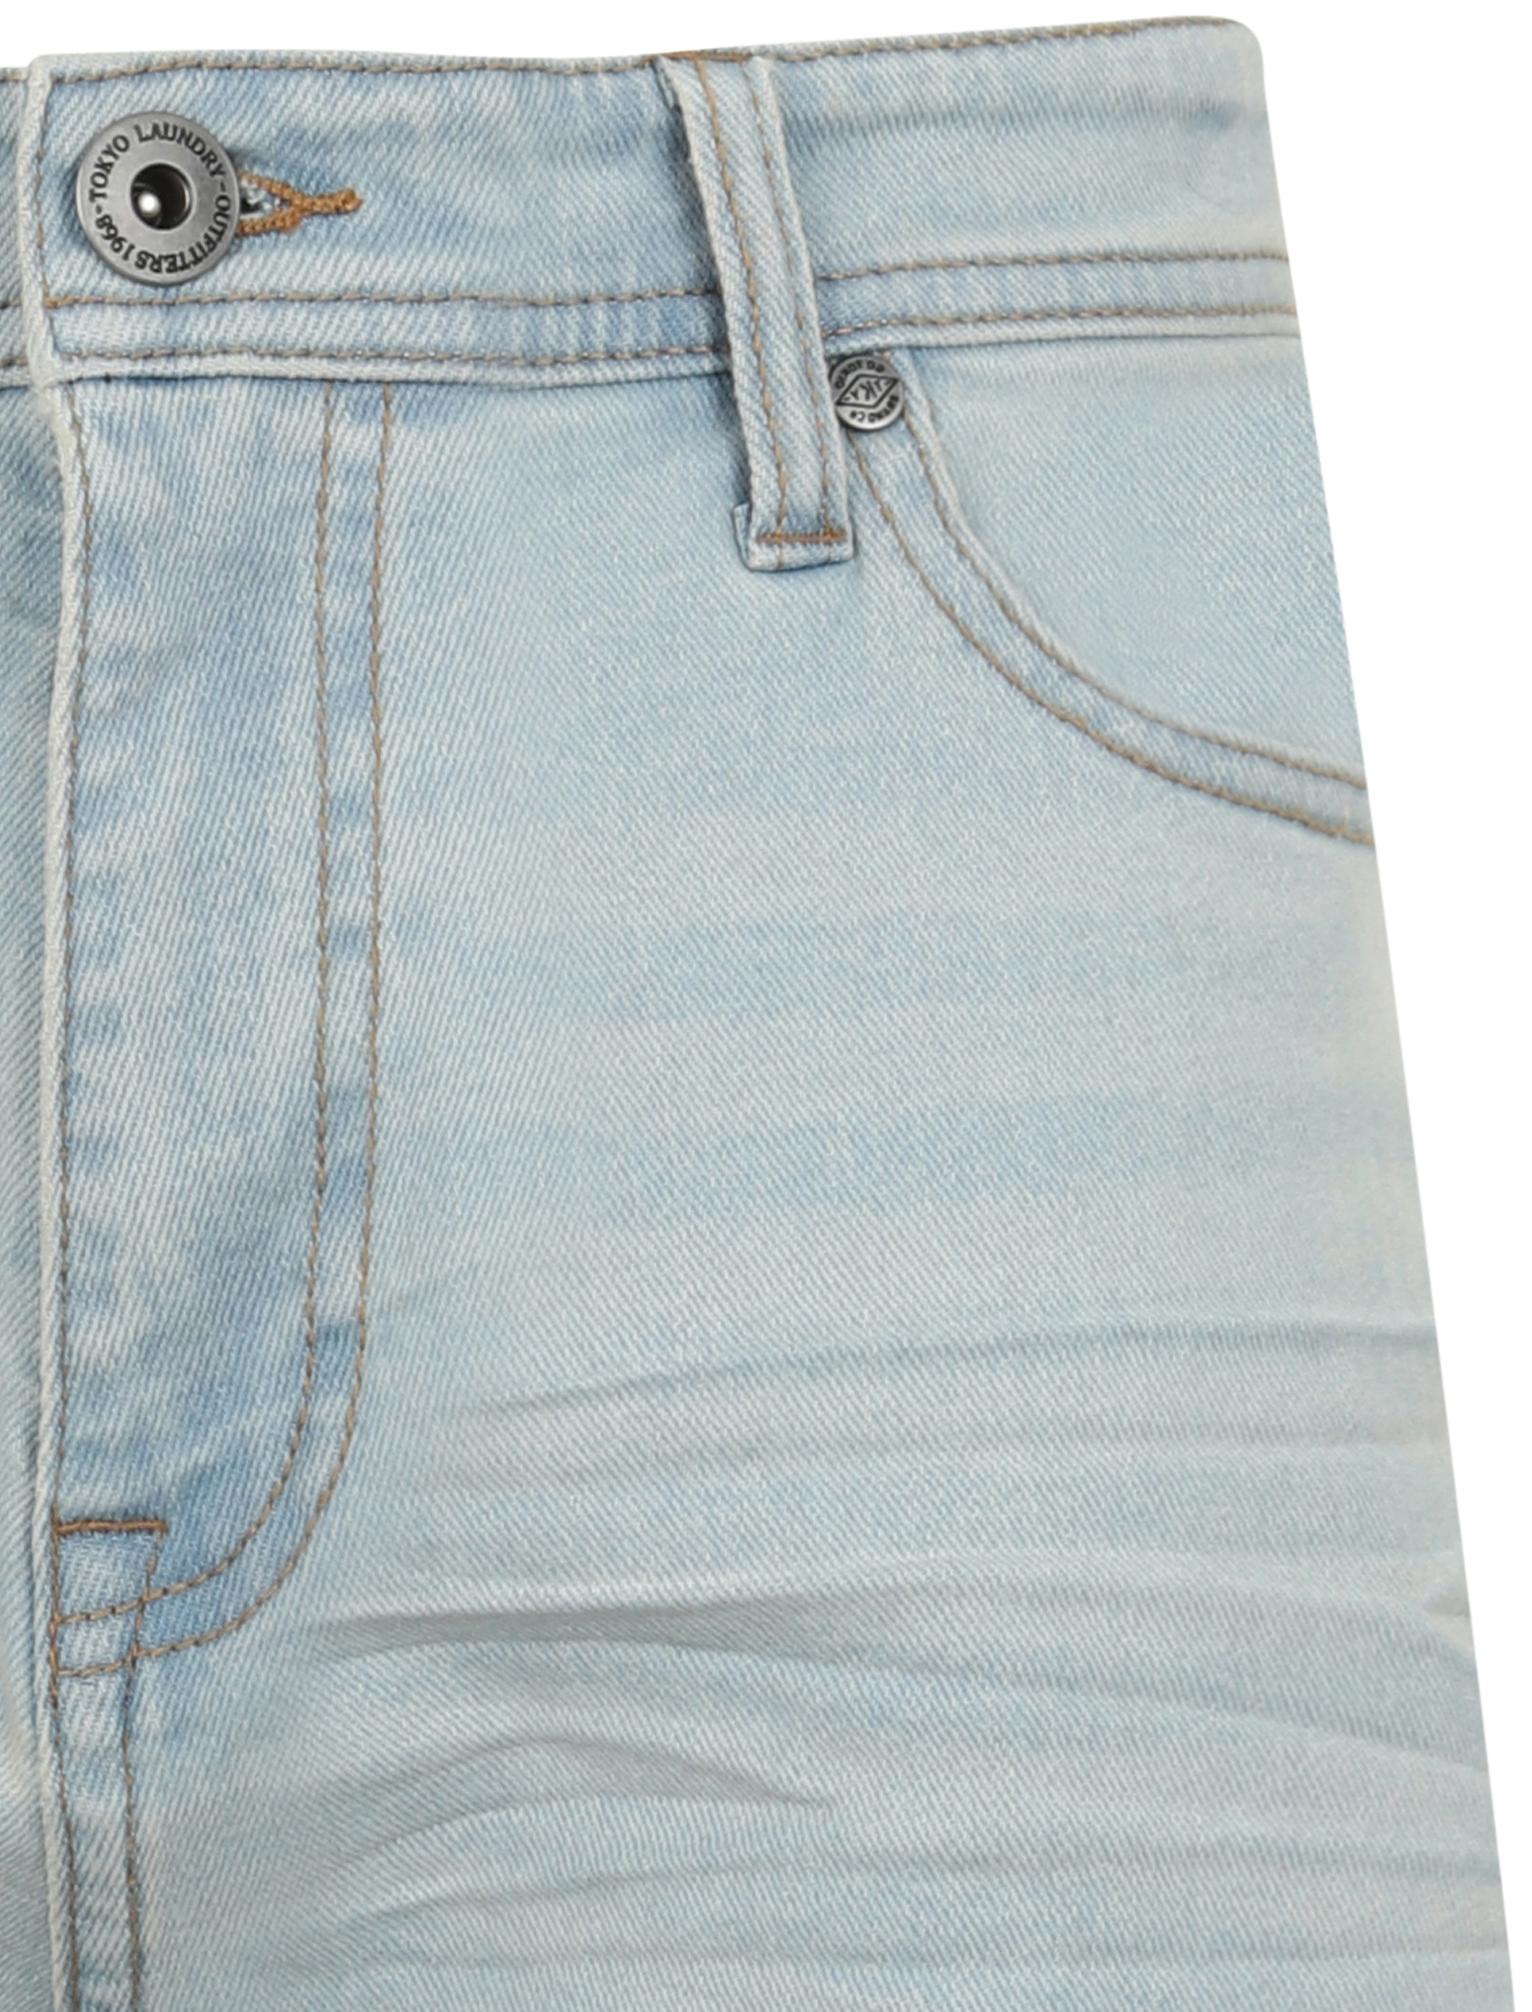 Tokyo-Laundry-Mens-Stretch-Denim-Shorts-Chino-Jean-Vintage-Dark-Light-Wash-Slim thumbnail 4